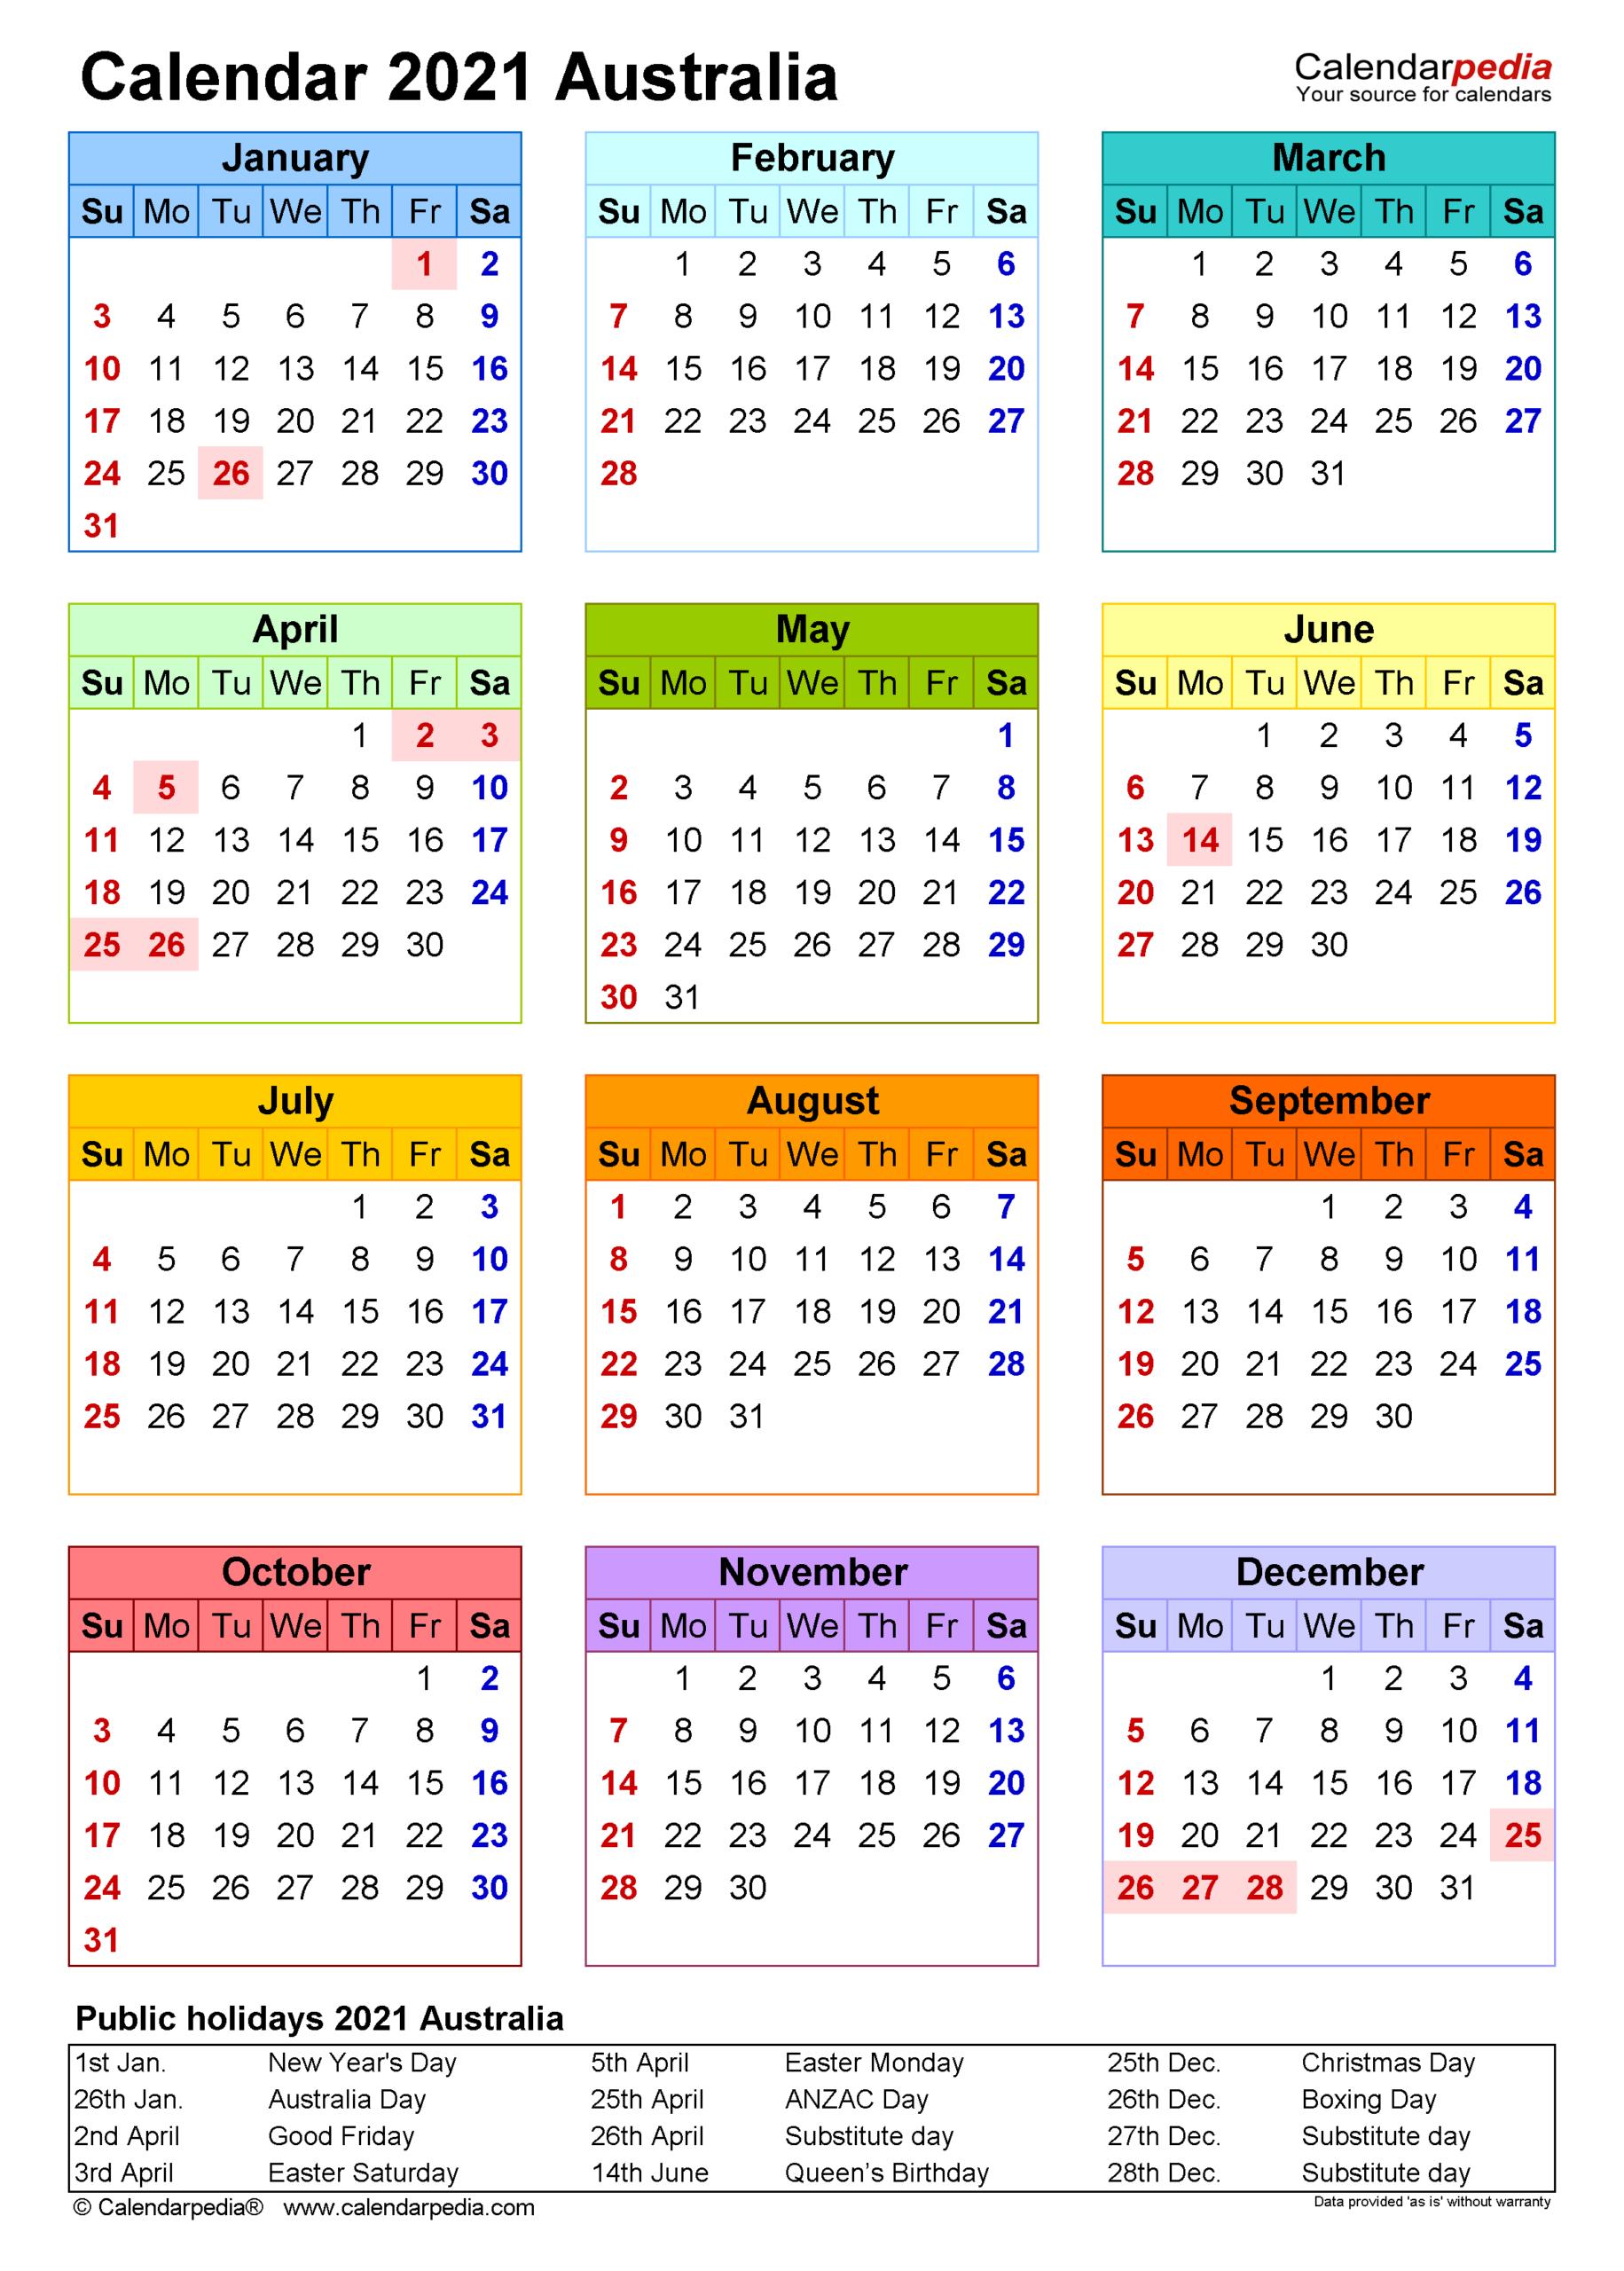 Australia Calendar 2021 - Free Printable Pdf Templates intended for Printable Pocket Size Calendar 2021